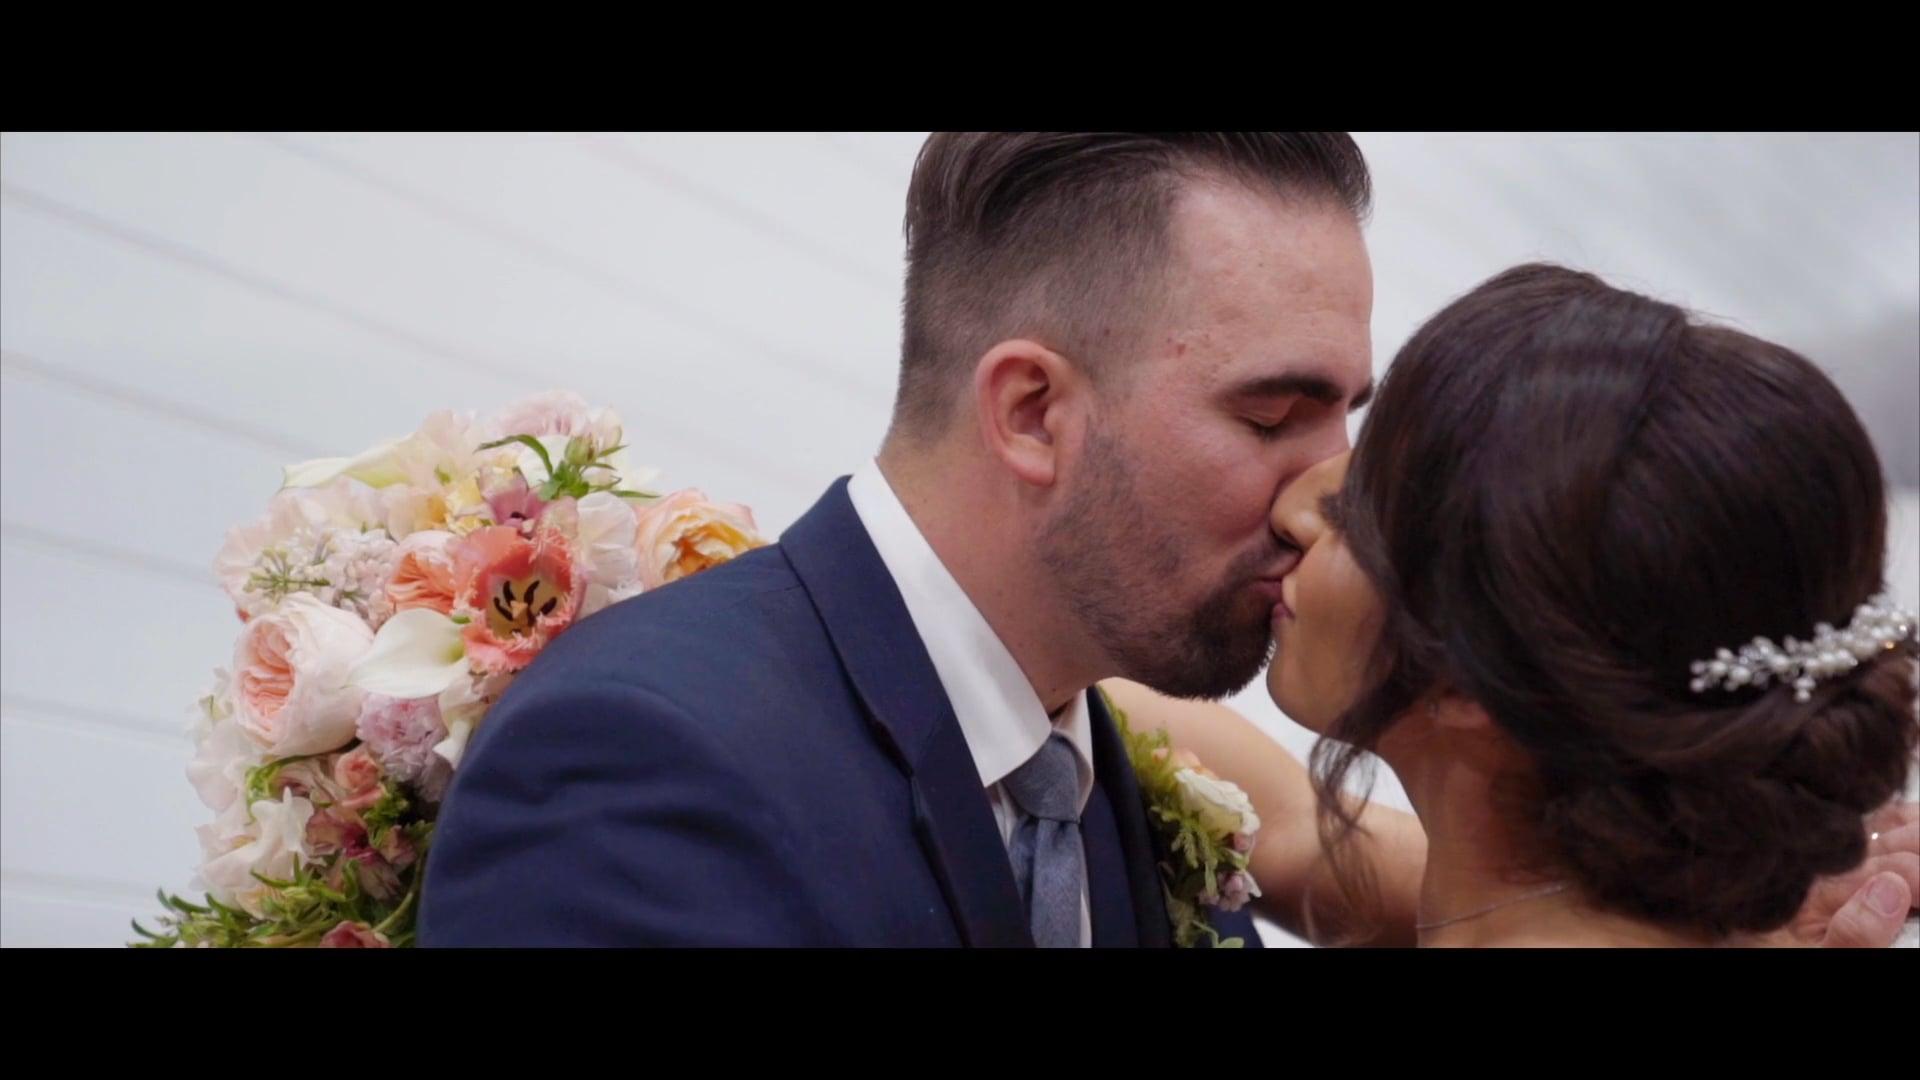 Mike & Adriana's Wedding Video